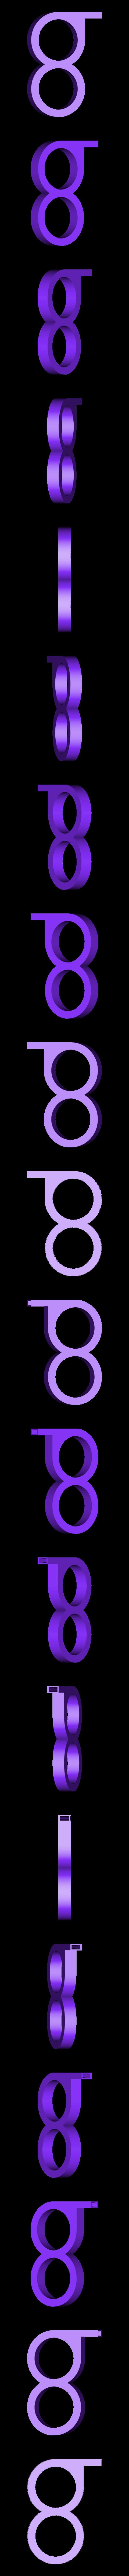 DuoToneWhistle1.stl Download free STL file Duo Tone Whistle • 3D printing model, Raeunn3D